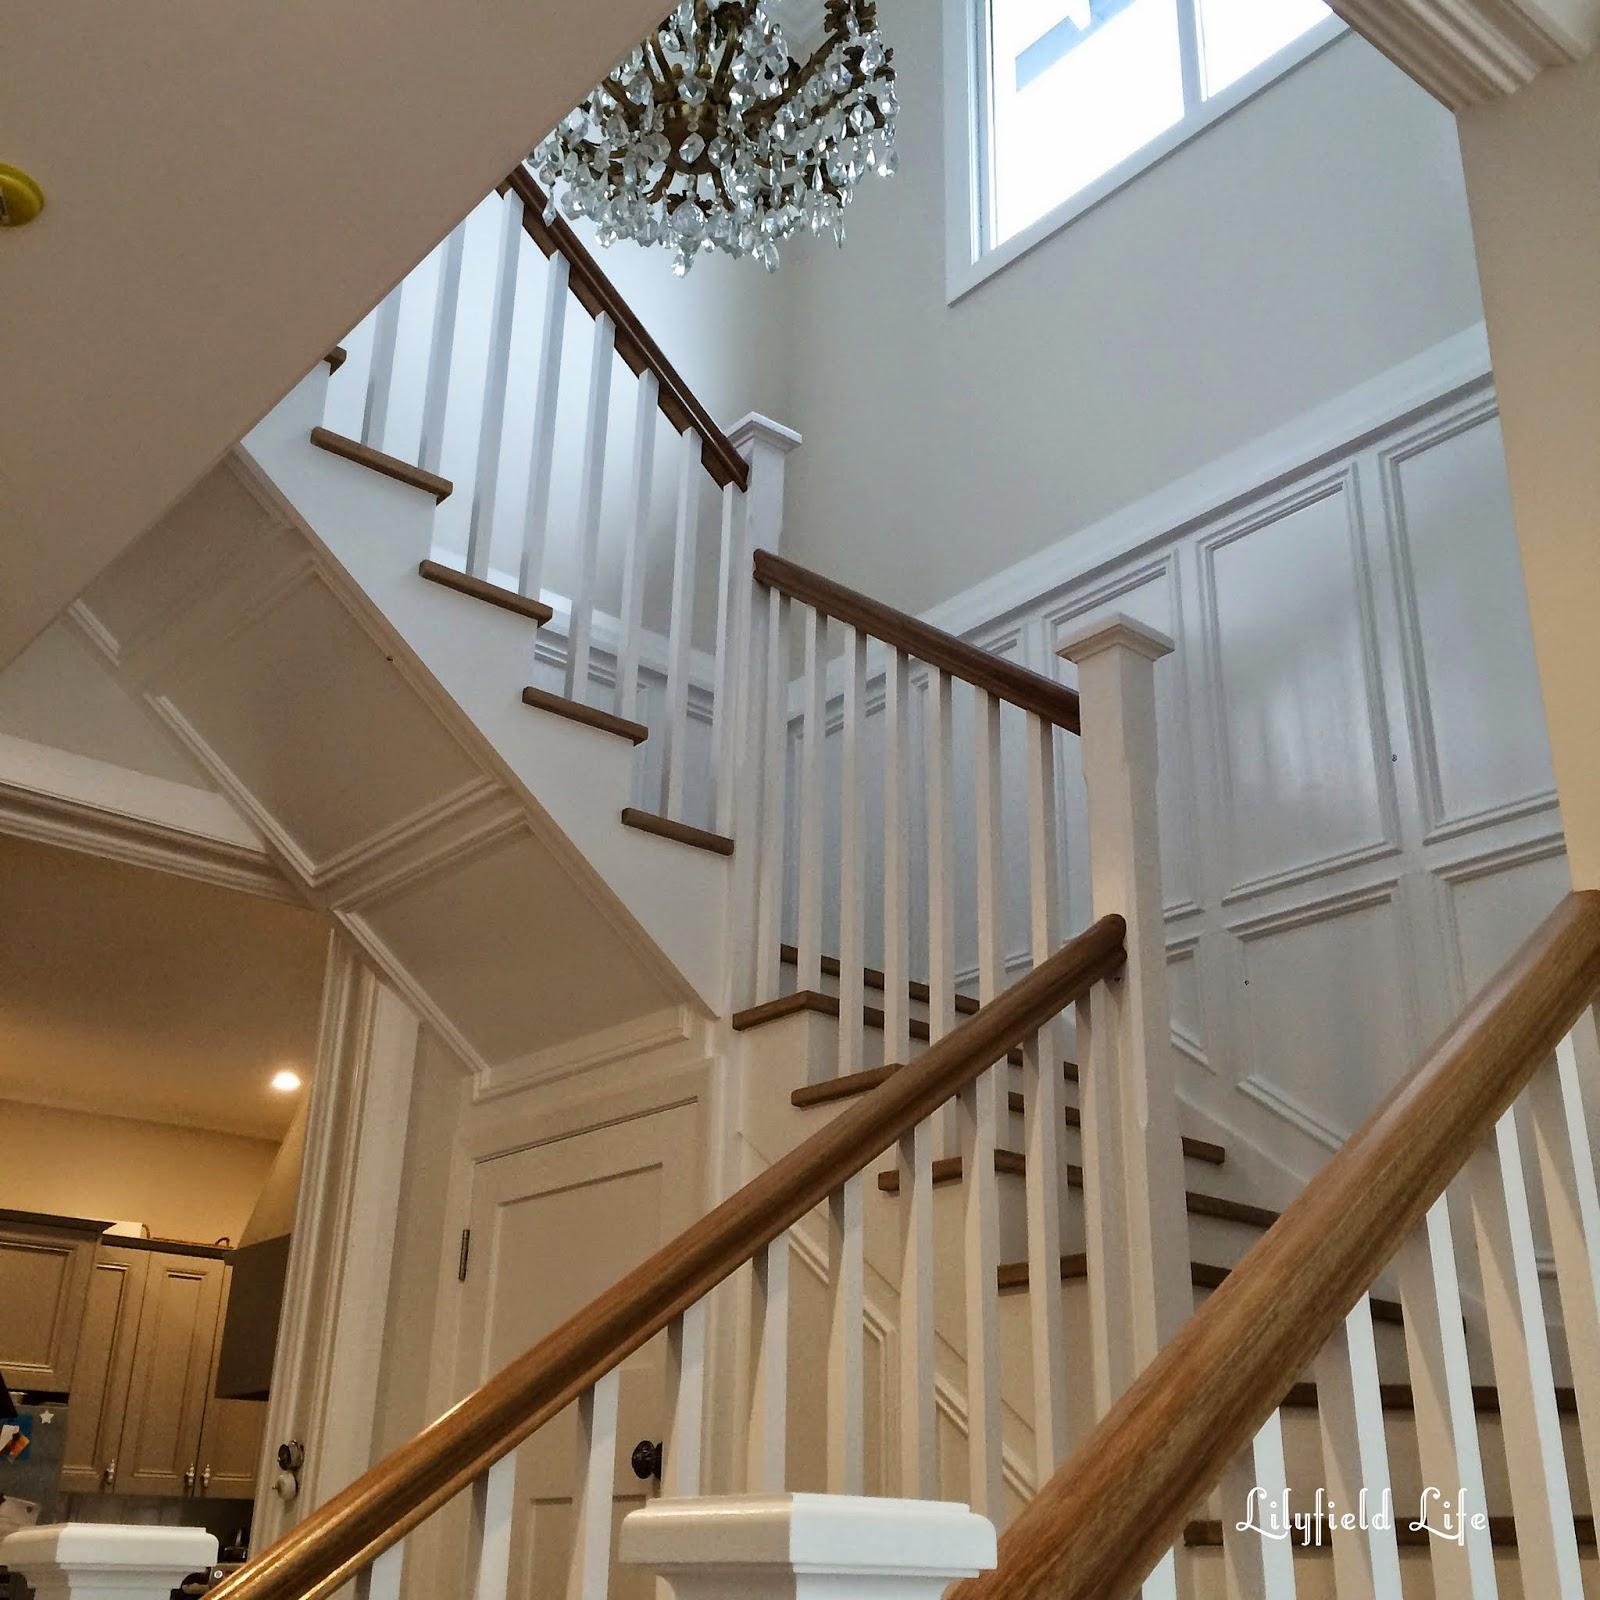 Stair Case: Lilyfield Life: Renovation Update: Staircase Progress